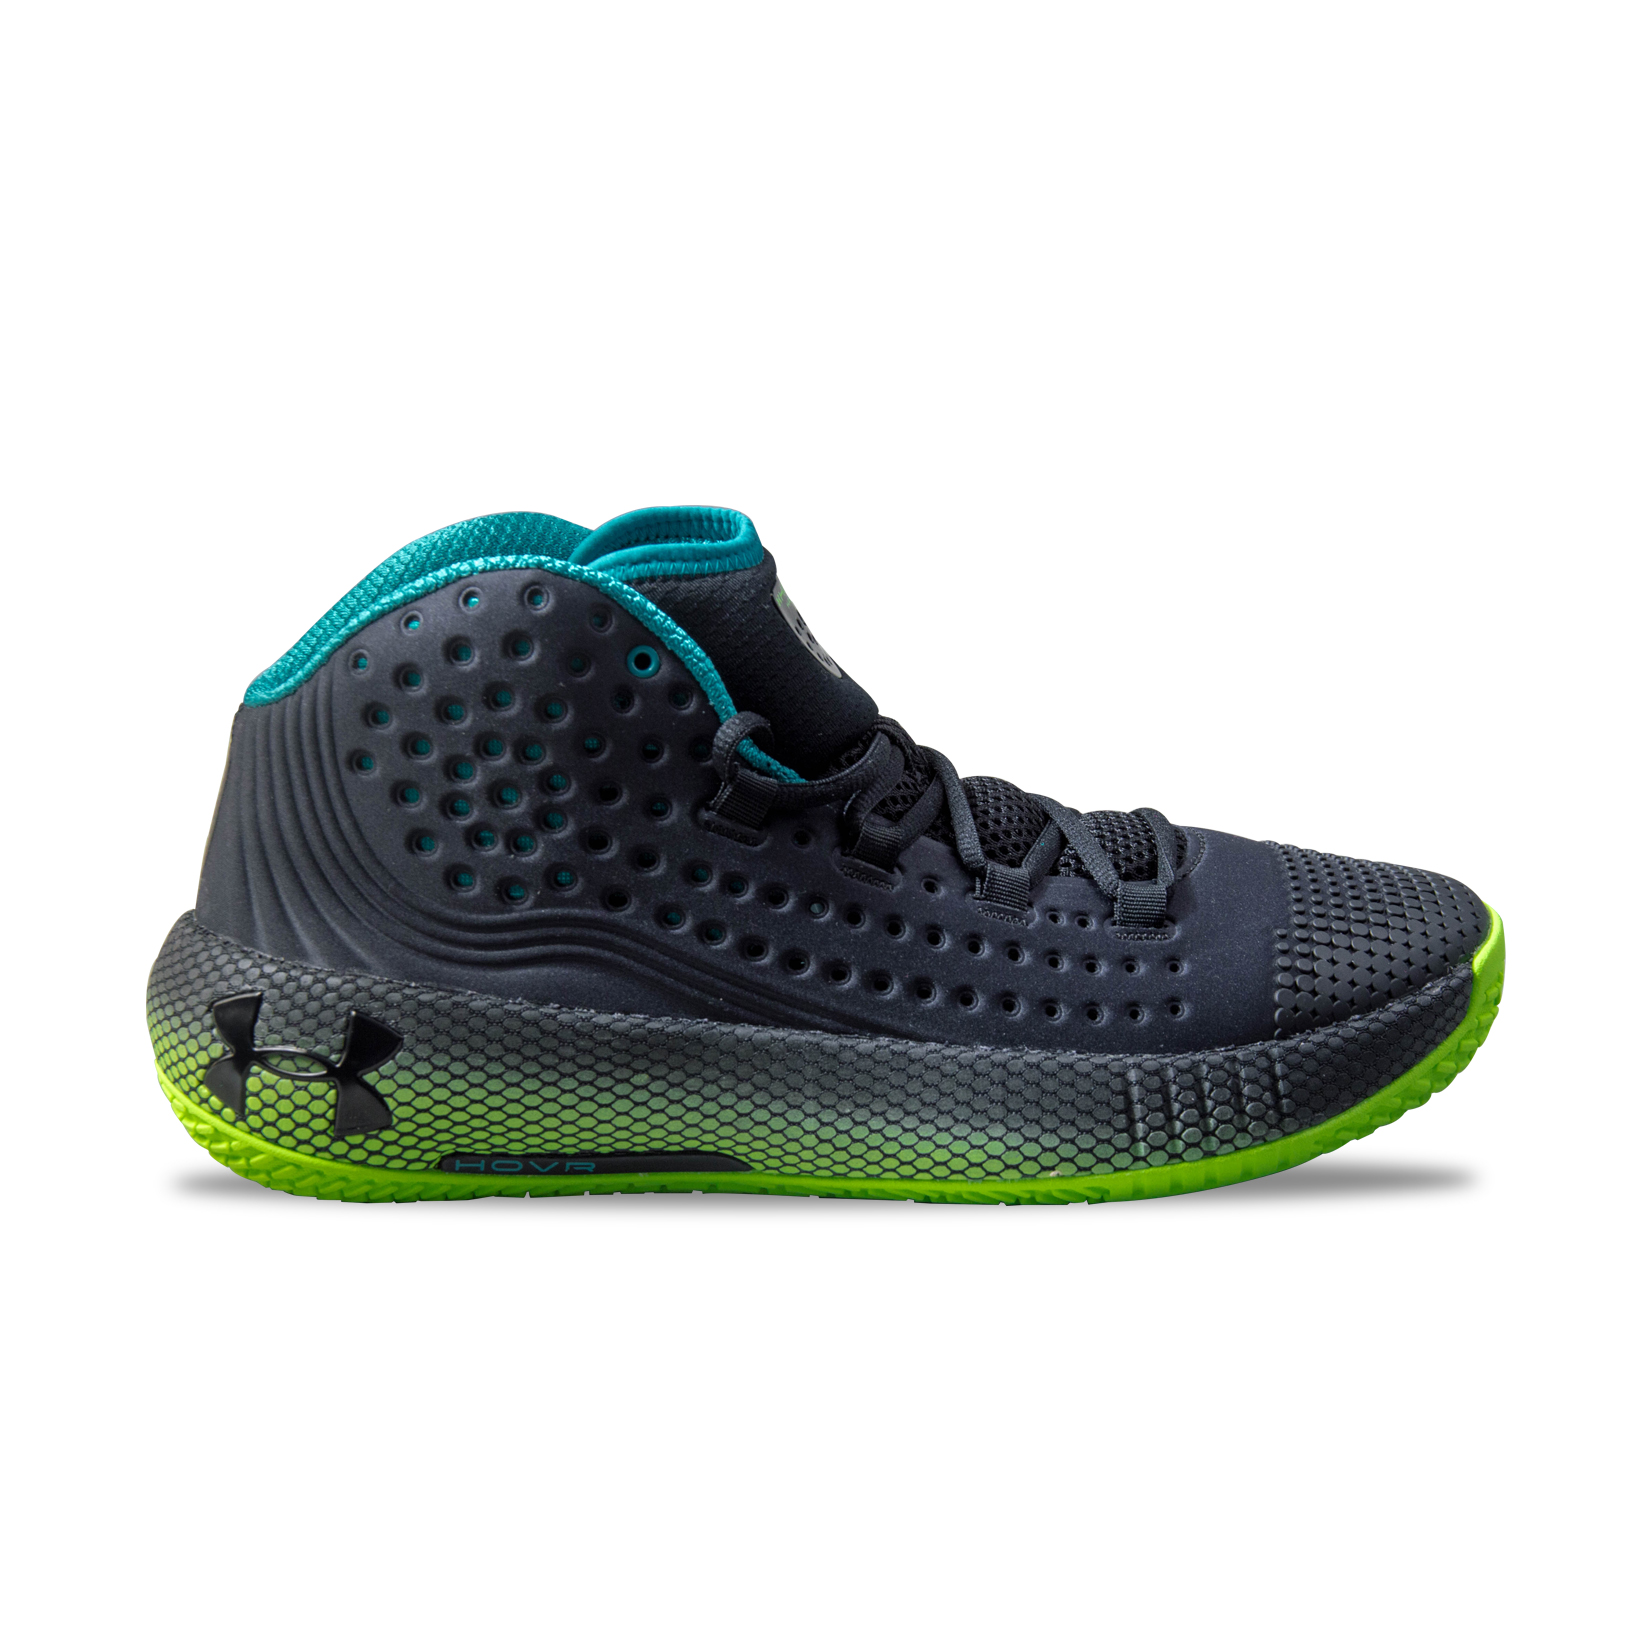 online store fd11e d804a Unisex Basketball Shoes Under Armour Hovr Havoc 2 Black ...